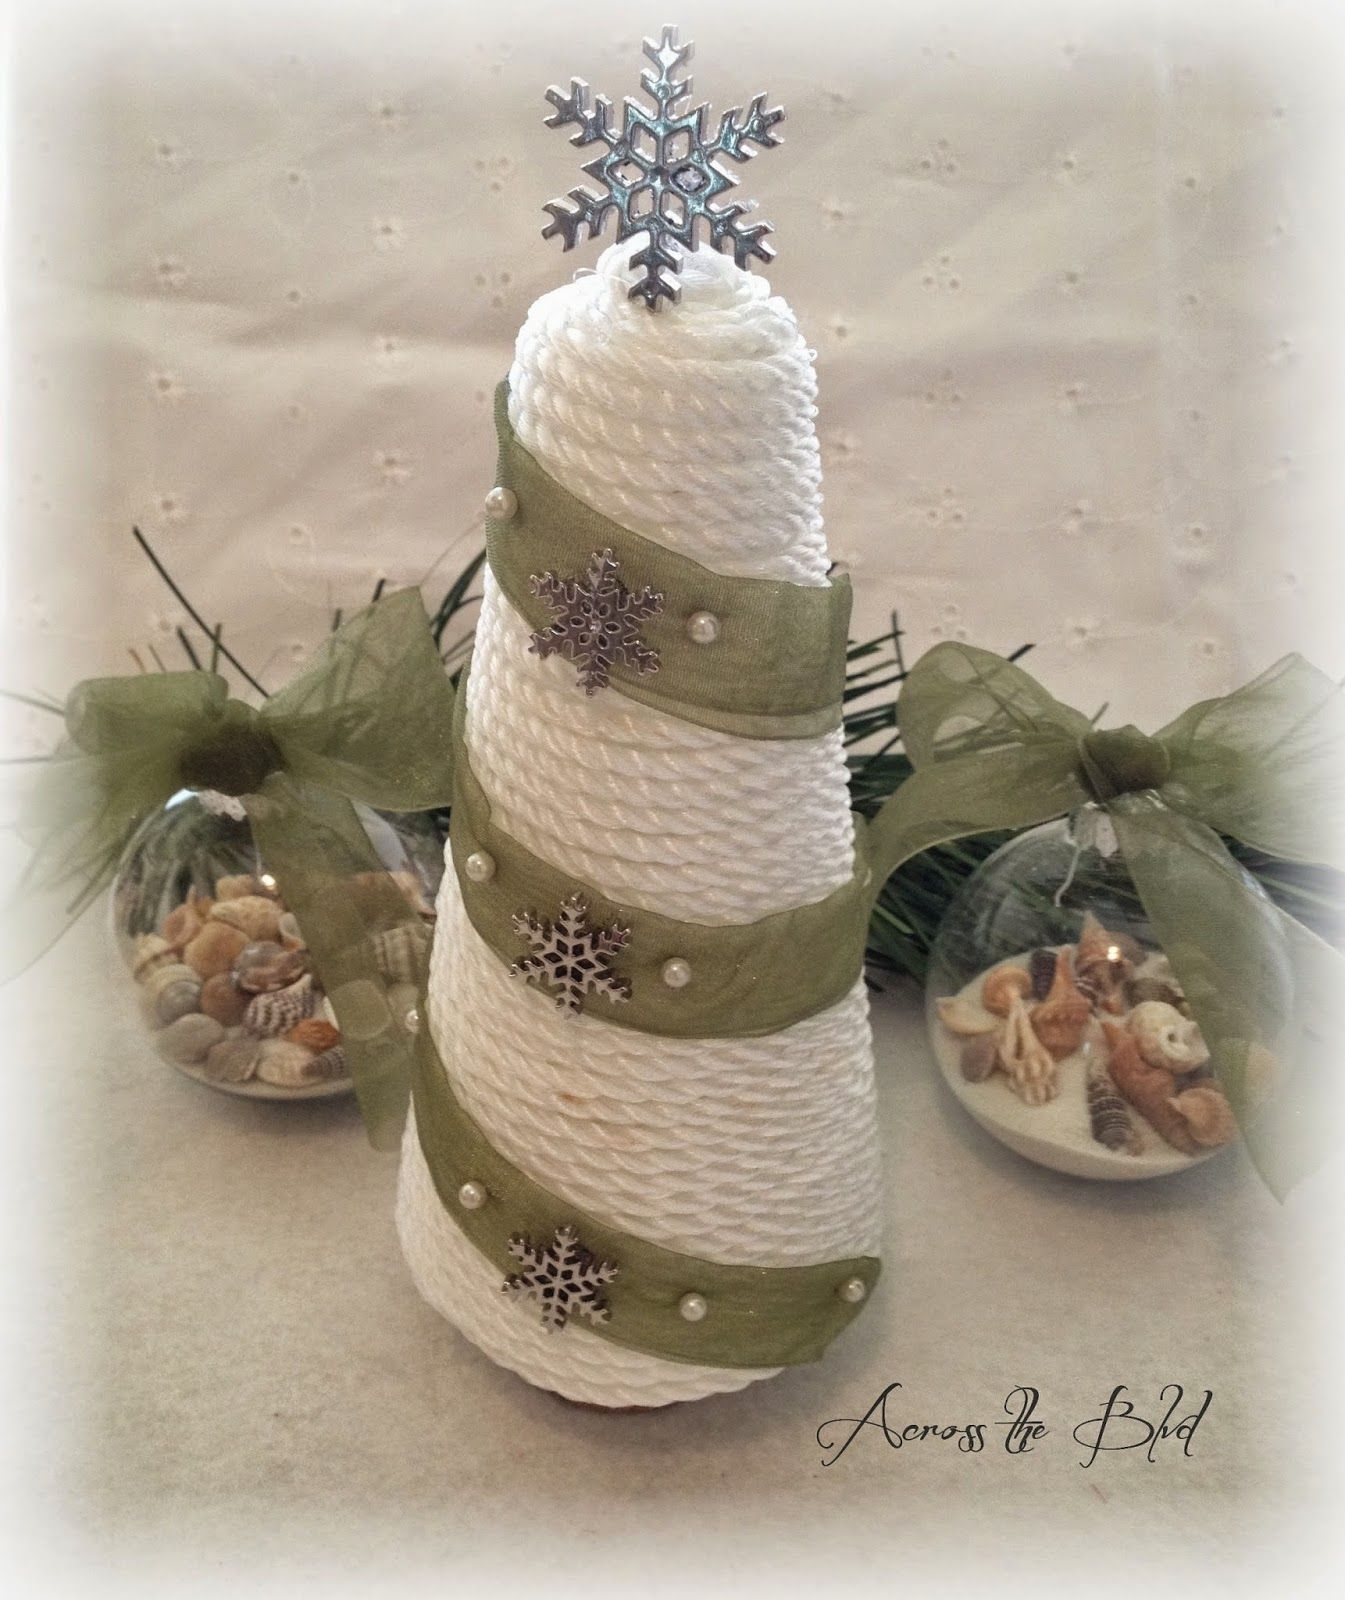 How To Make A Coastal Cone Tree and Sea Shell Ornaments